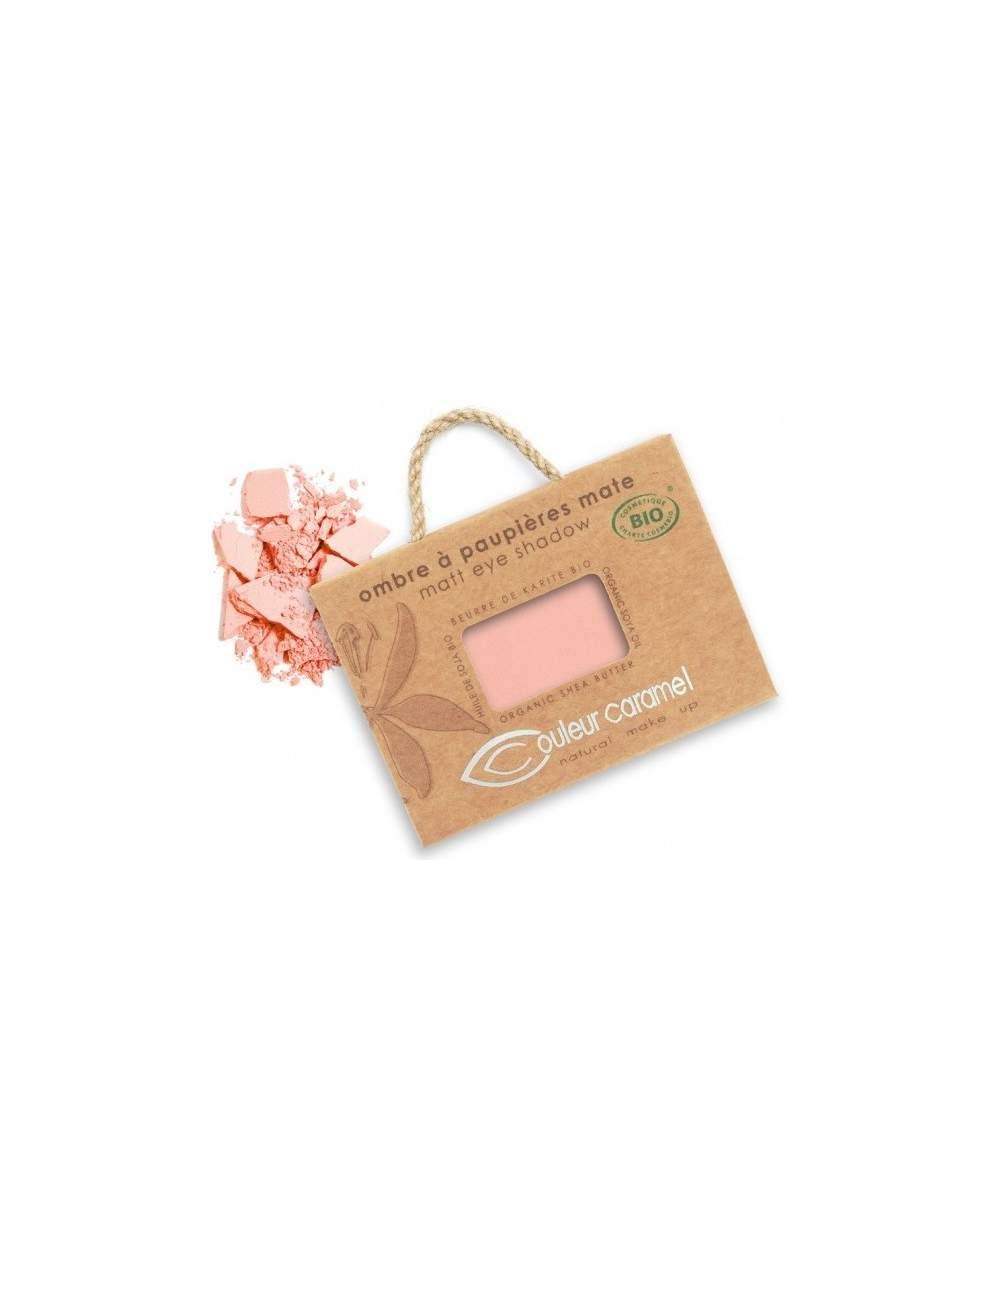 Sombra de Ojos Bio Mate 123 Baby Doll Pink. Couleur Caramel